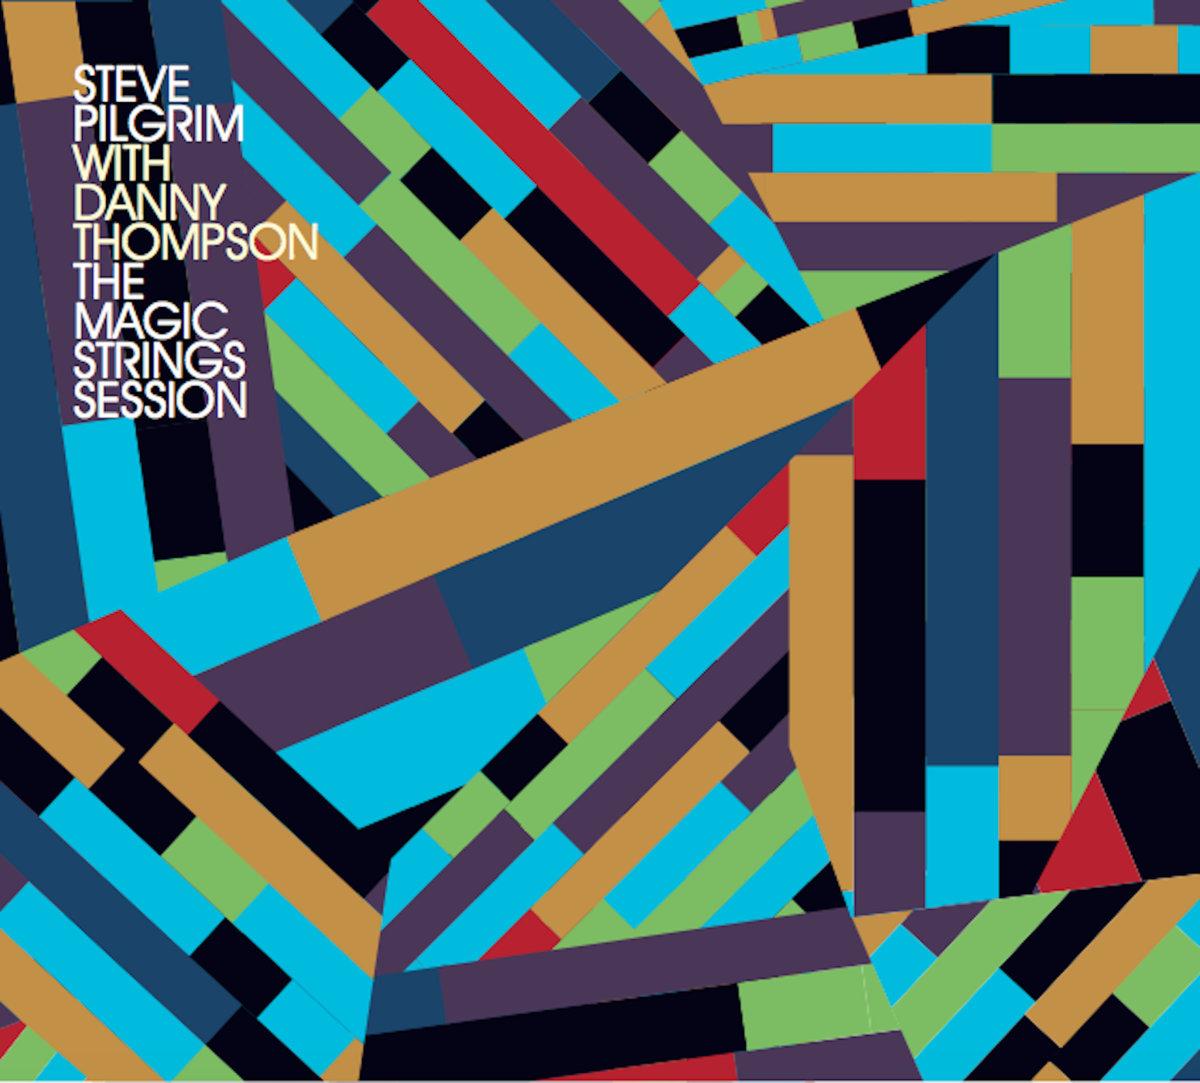 Steve Pilgrim with Danny Thompson - The Magic Session (2019)